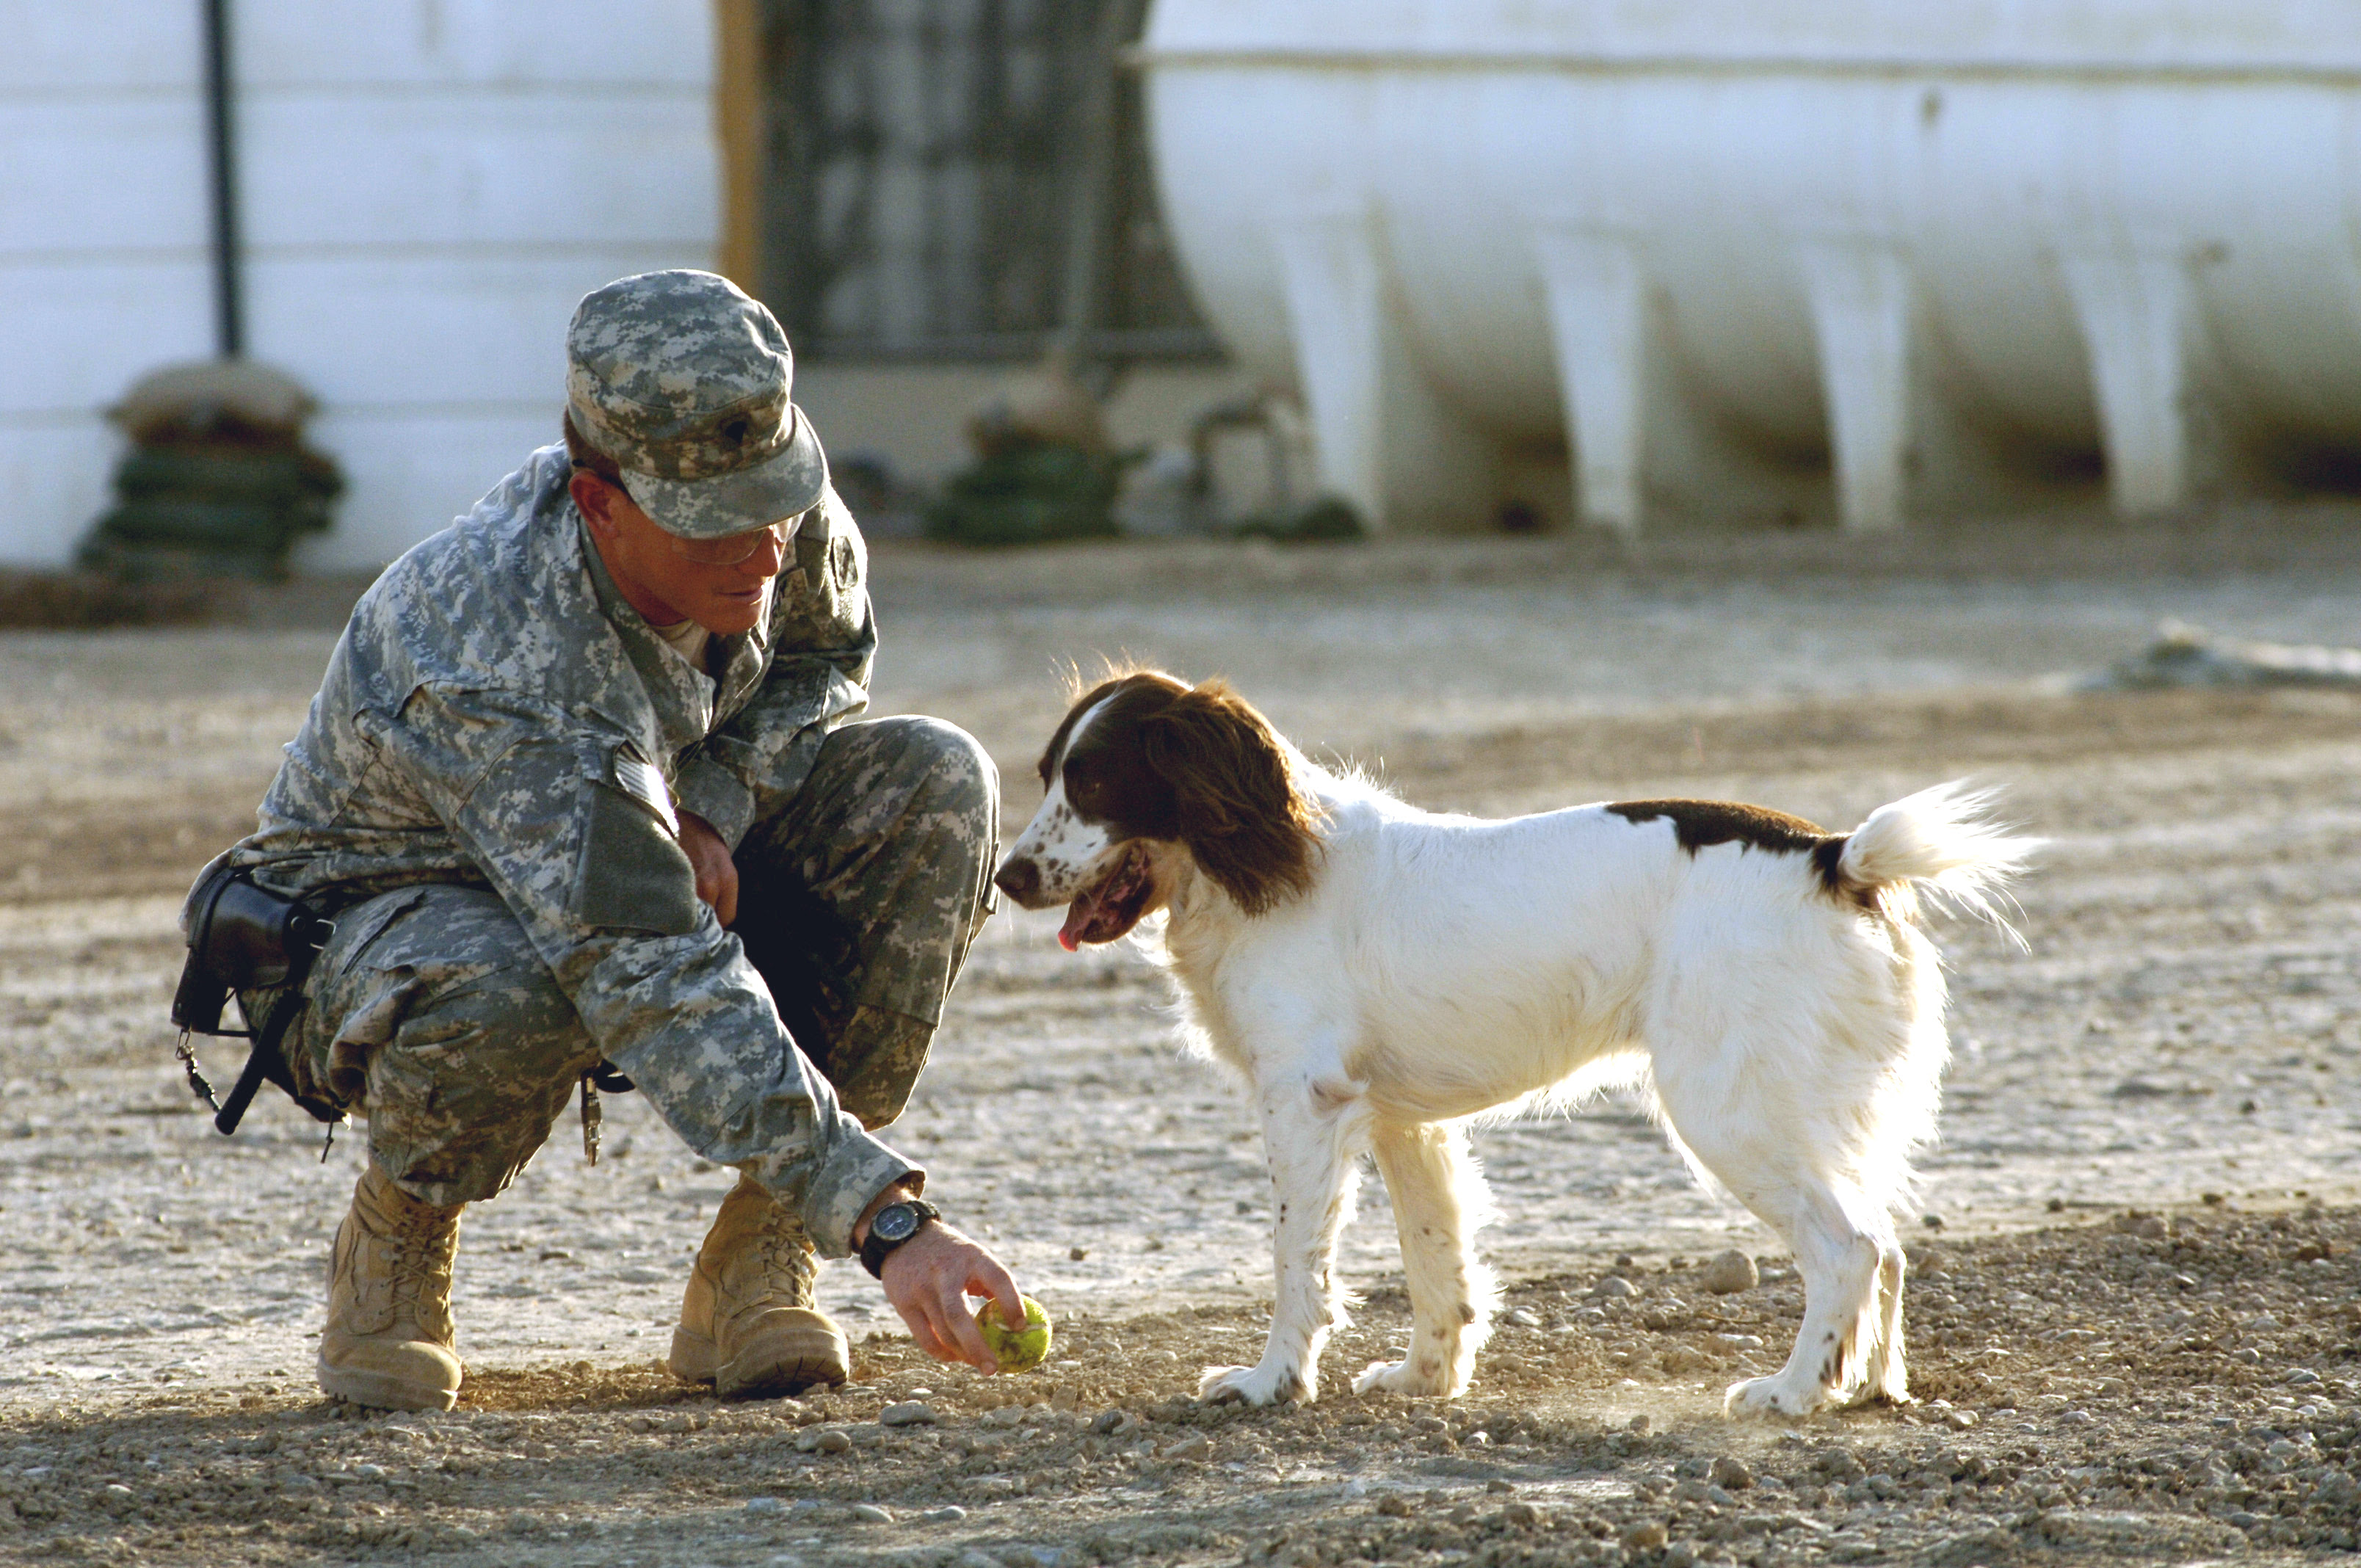 http://roxanaiordache.files.wordpress.com/2011/05/military-dog-defense-gov.jpg